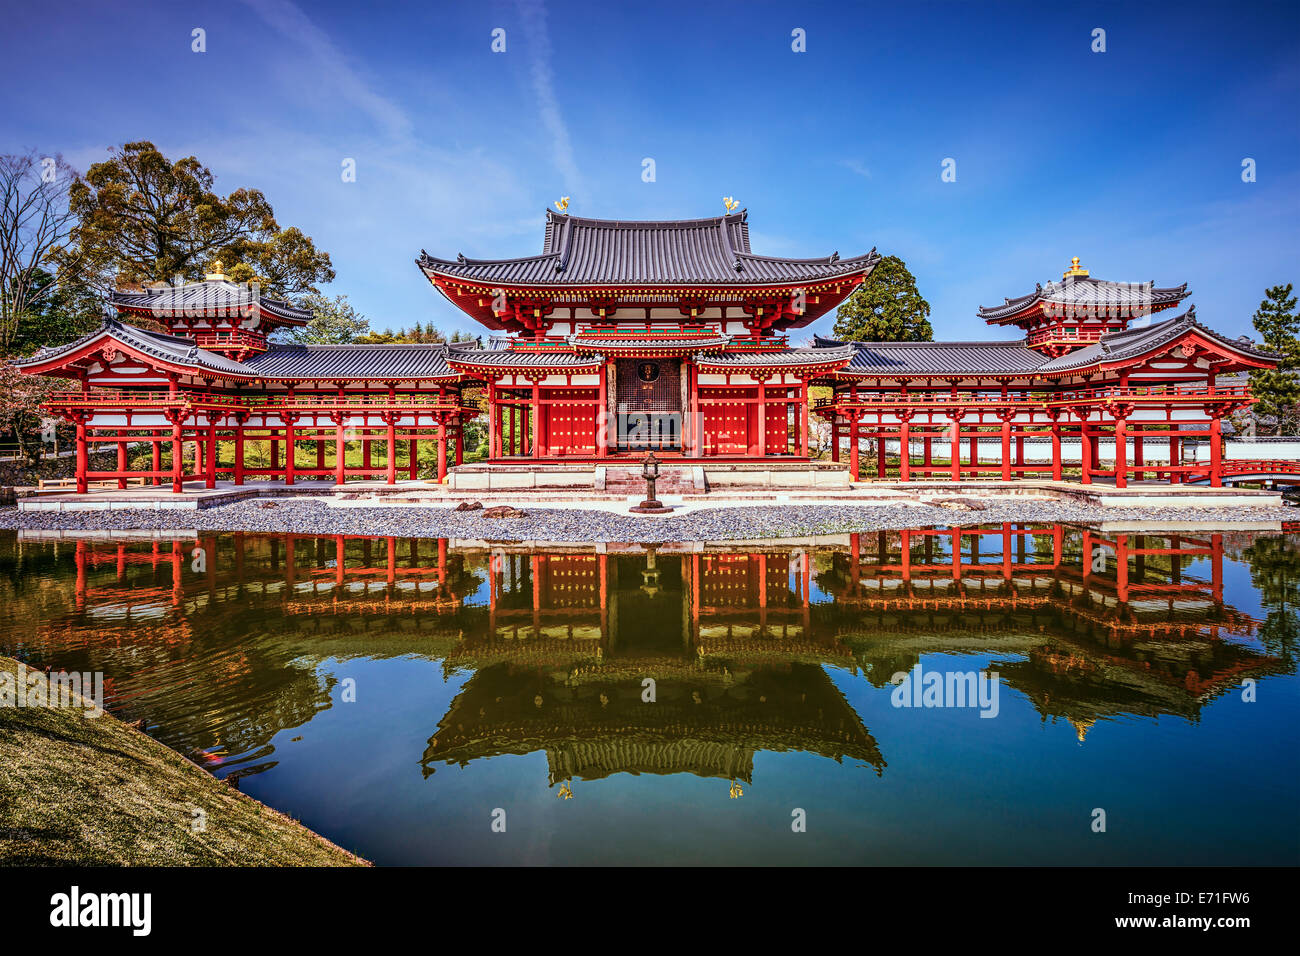 Kyoto, Japan bei Byodo-in Tempel und Garten. Stockbild